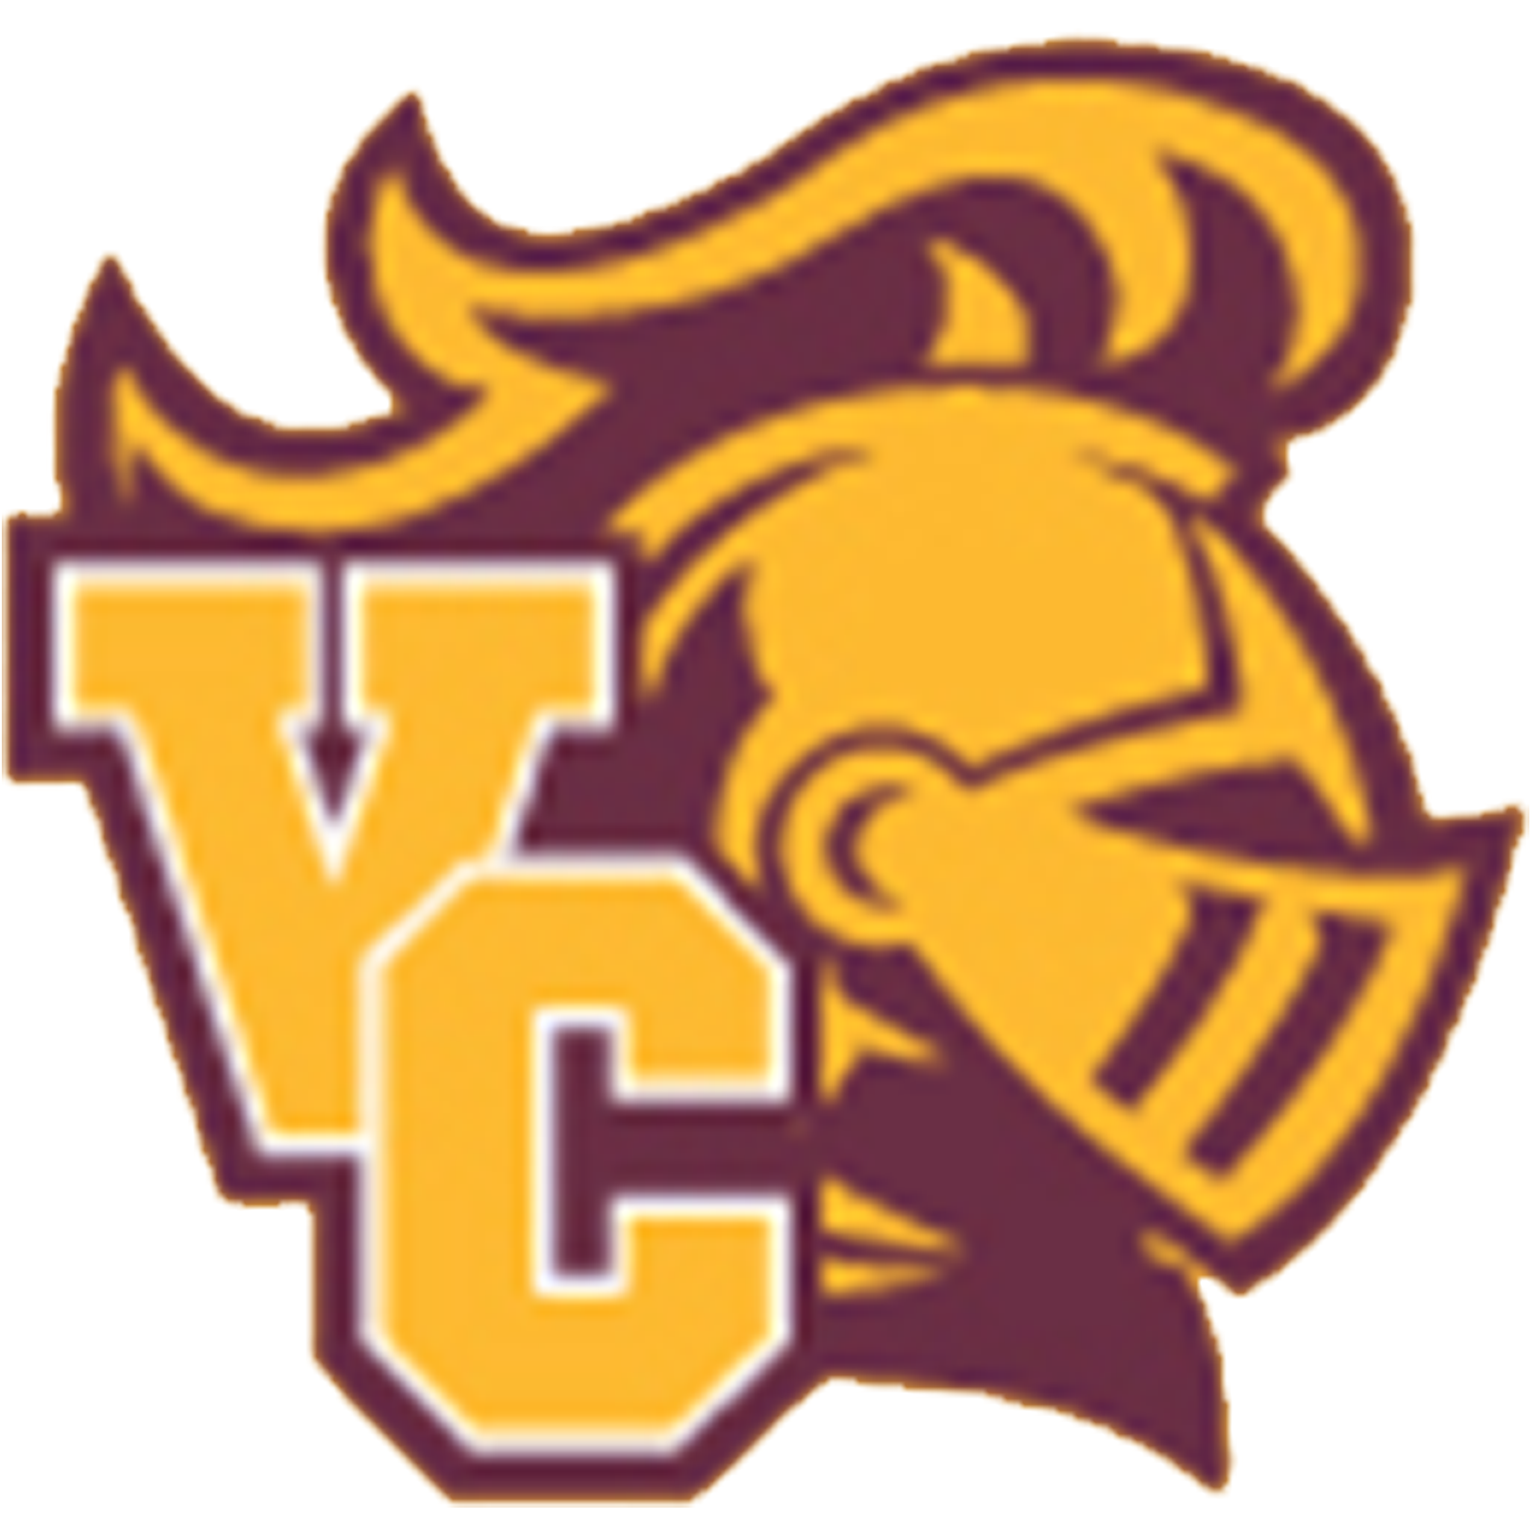 Valley Christian Crusaders